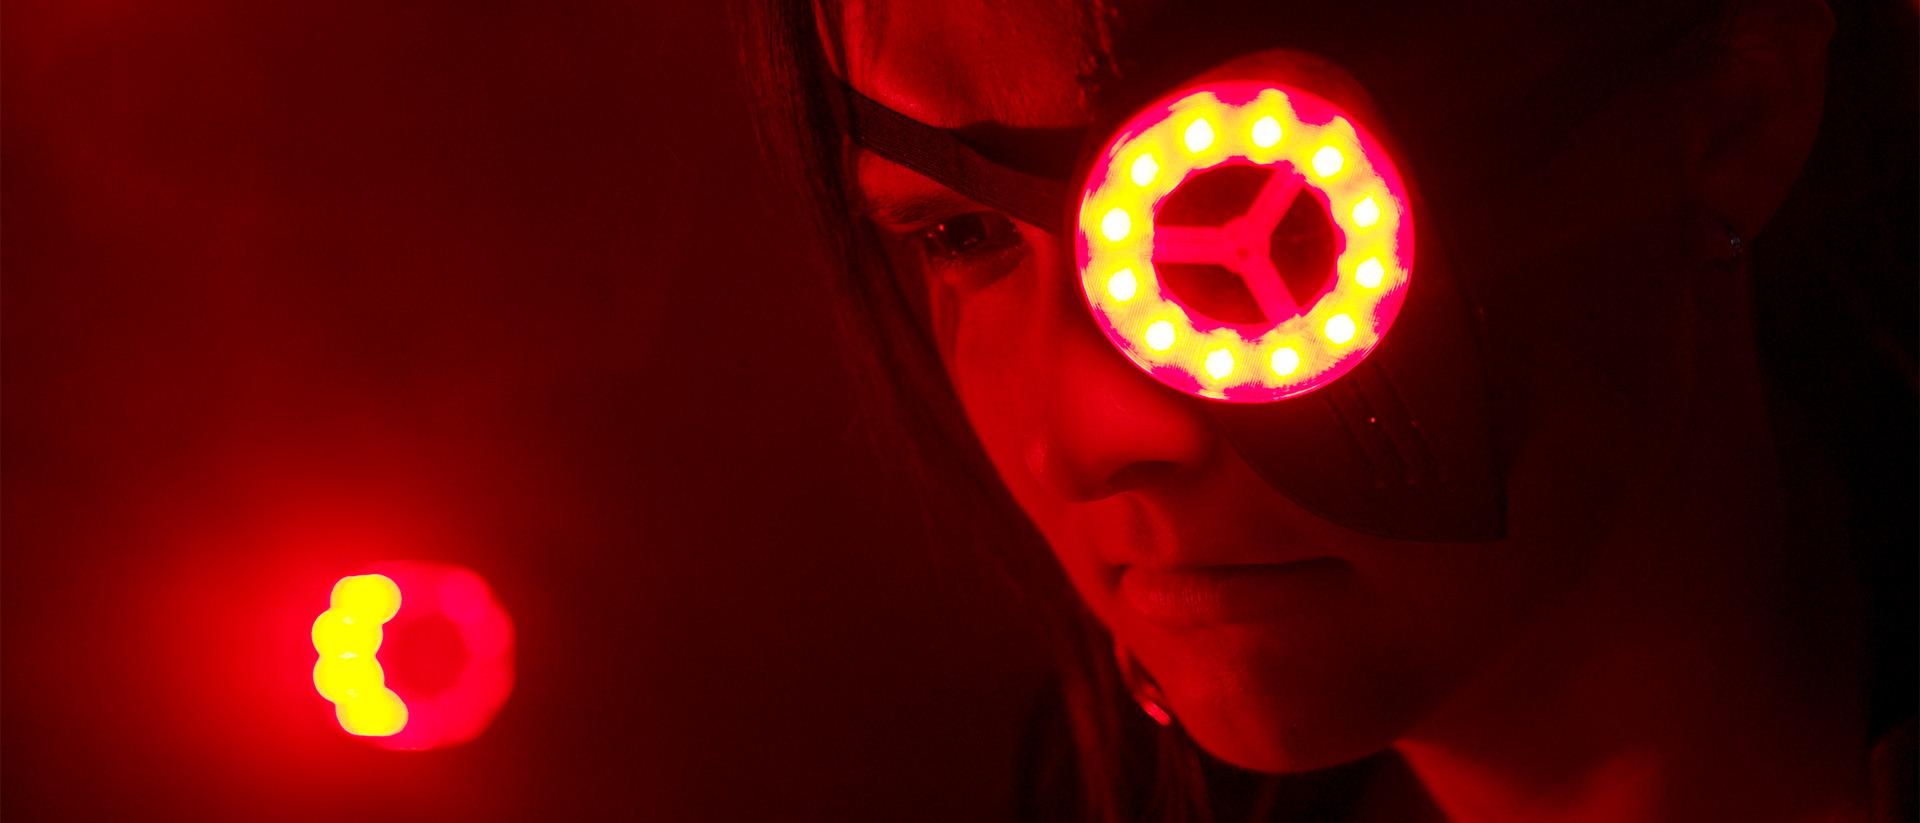 The Blaster II - artificial eye